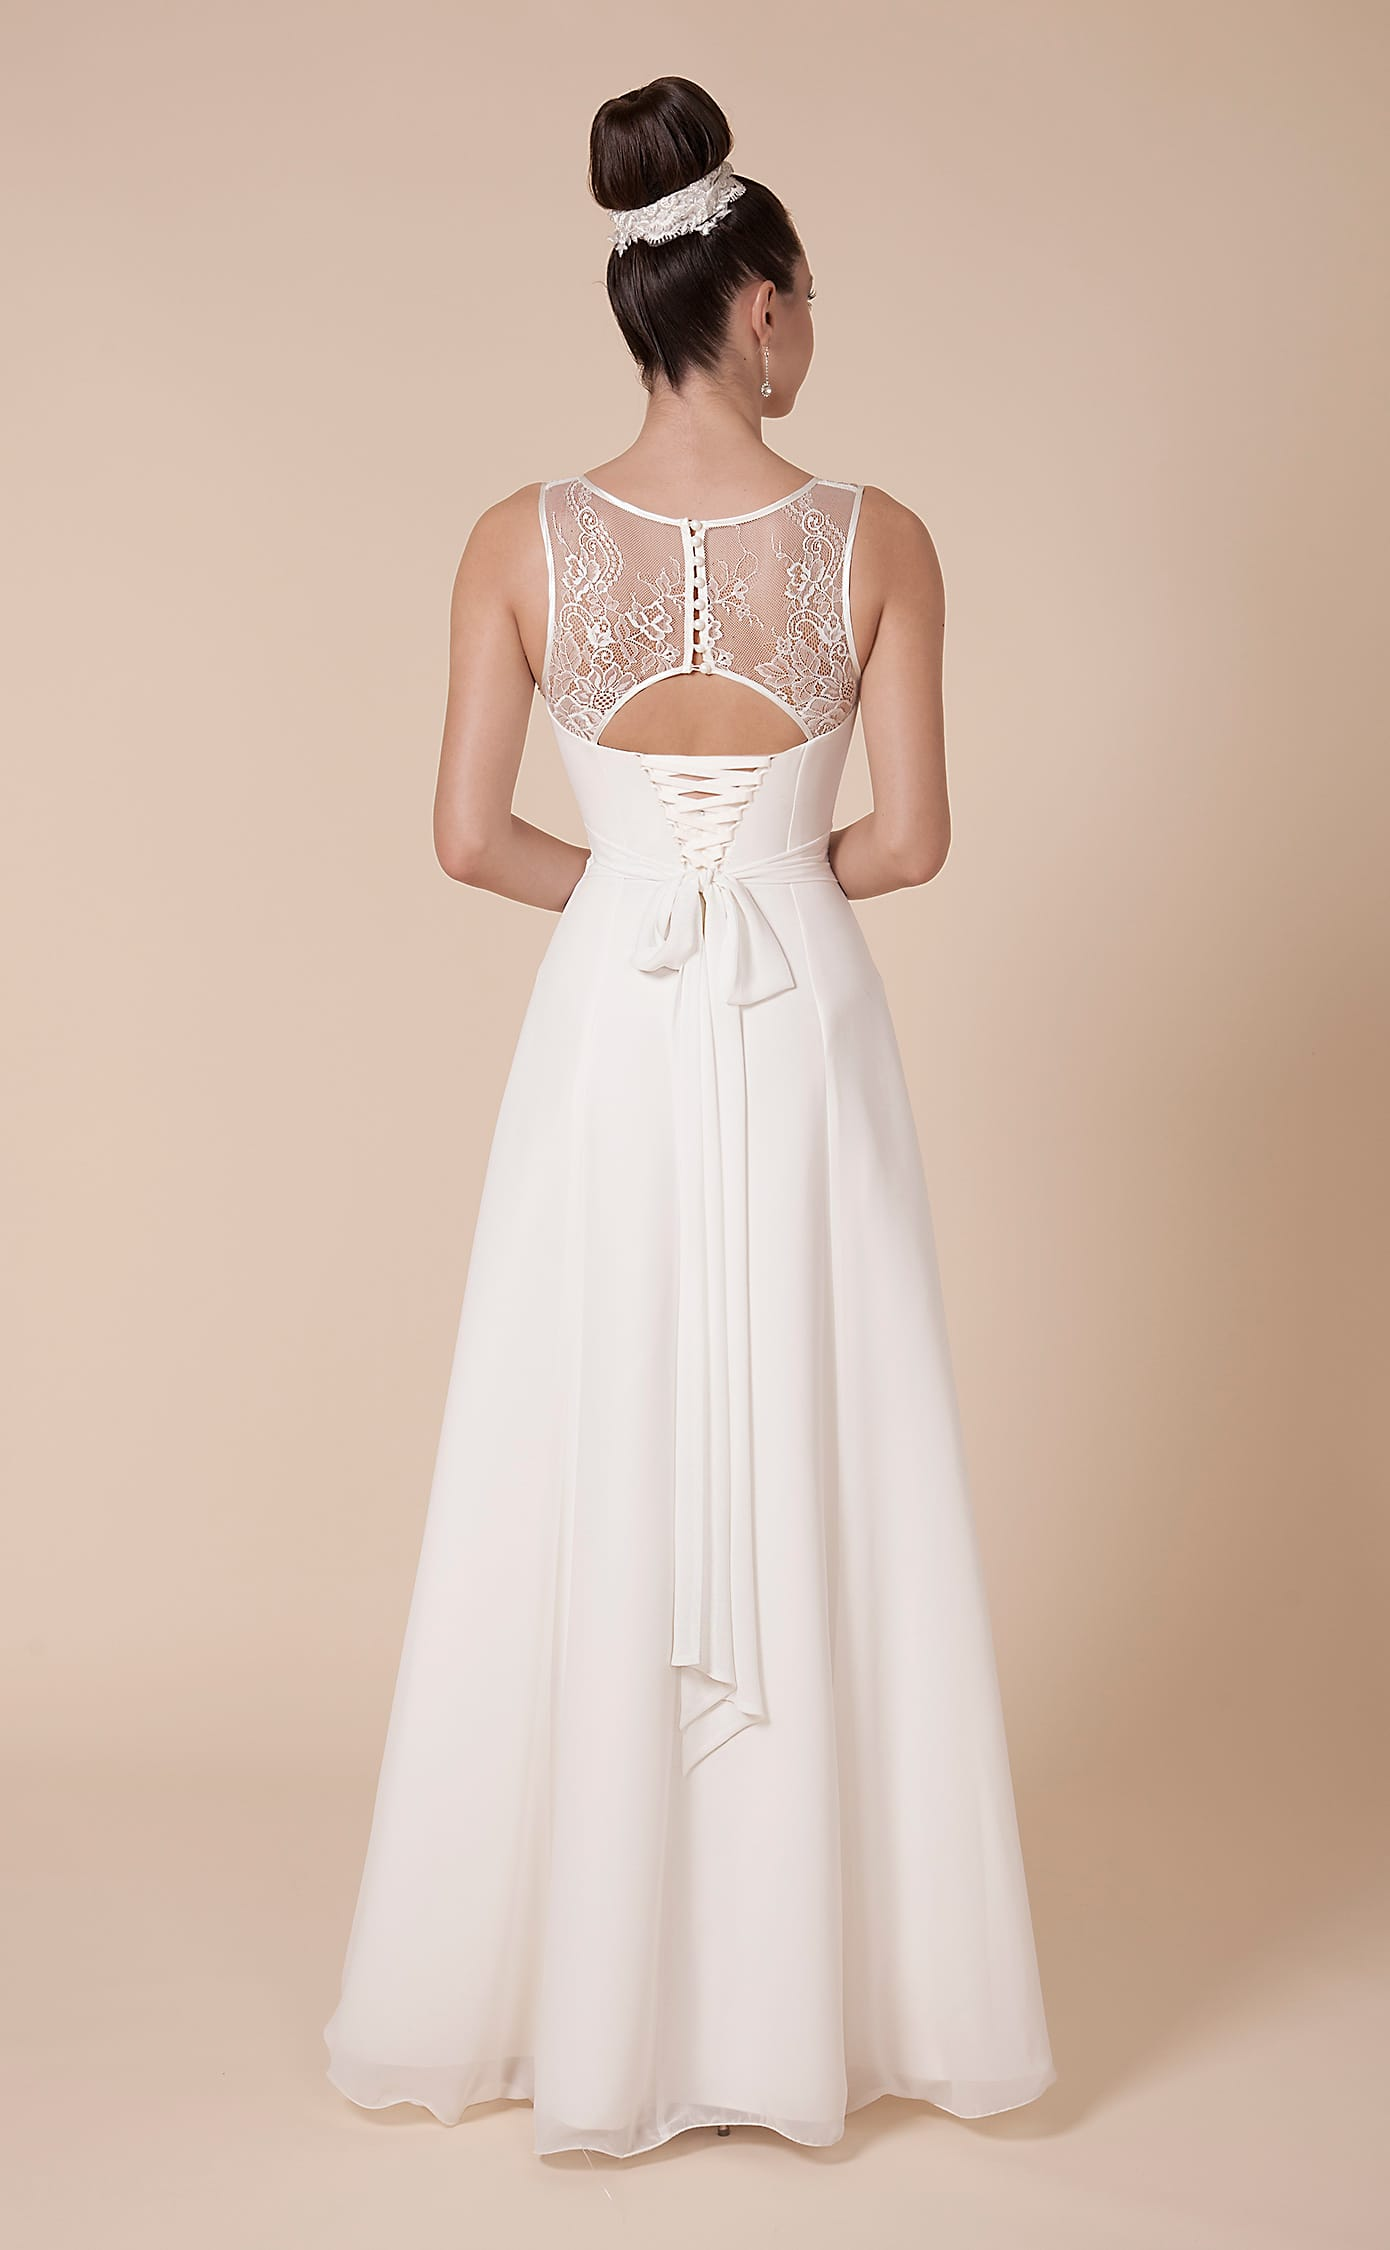 Lenovia sell my wedding dress online sell my wedding for Sell my wedding dress online